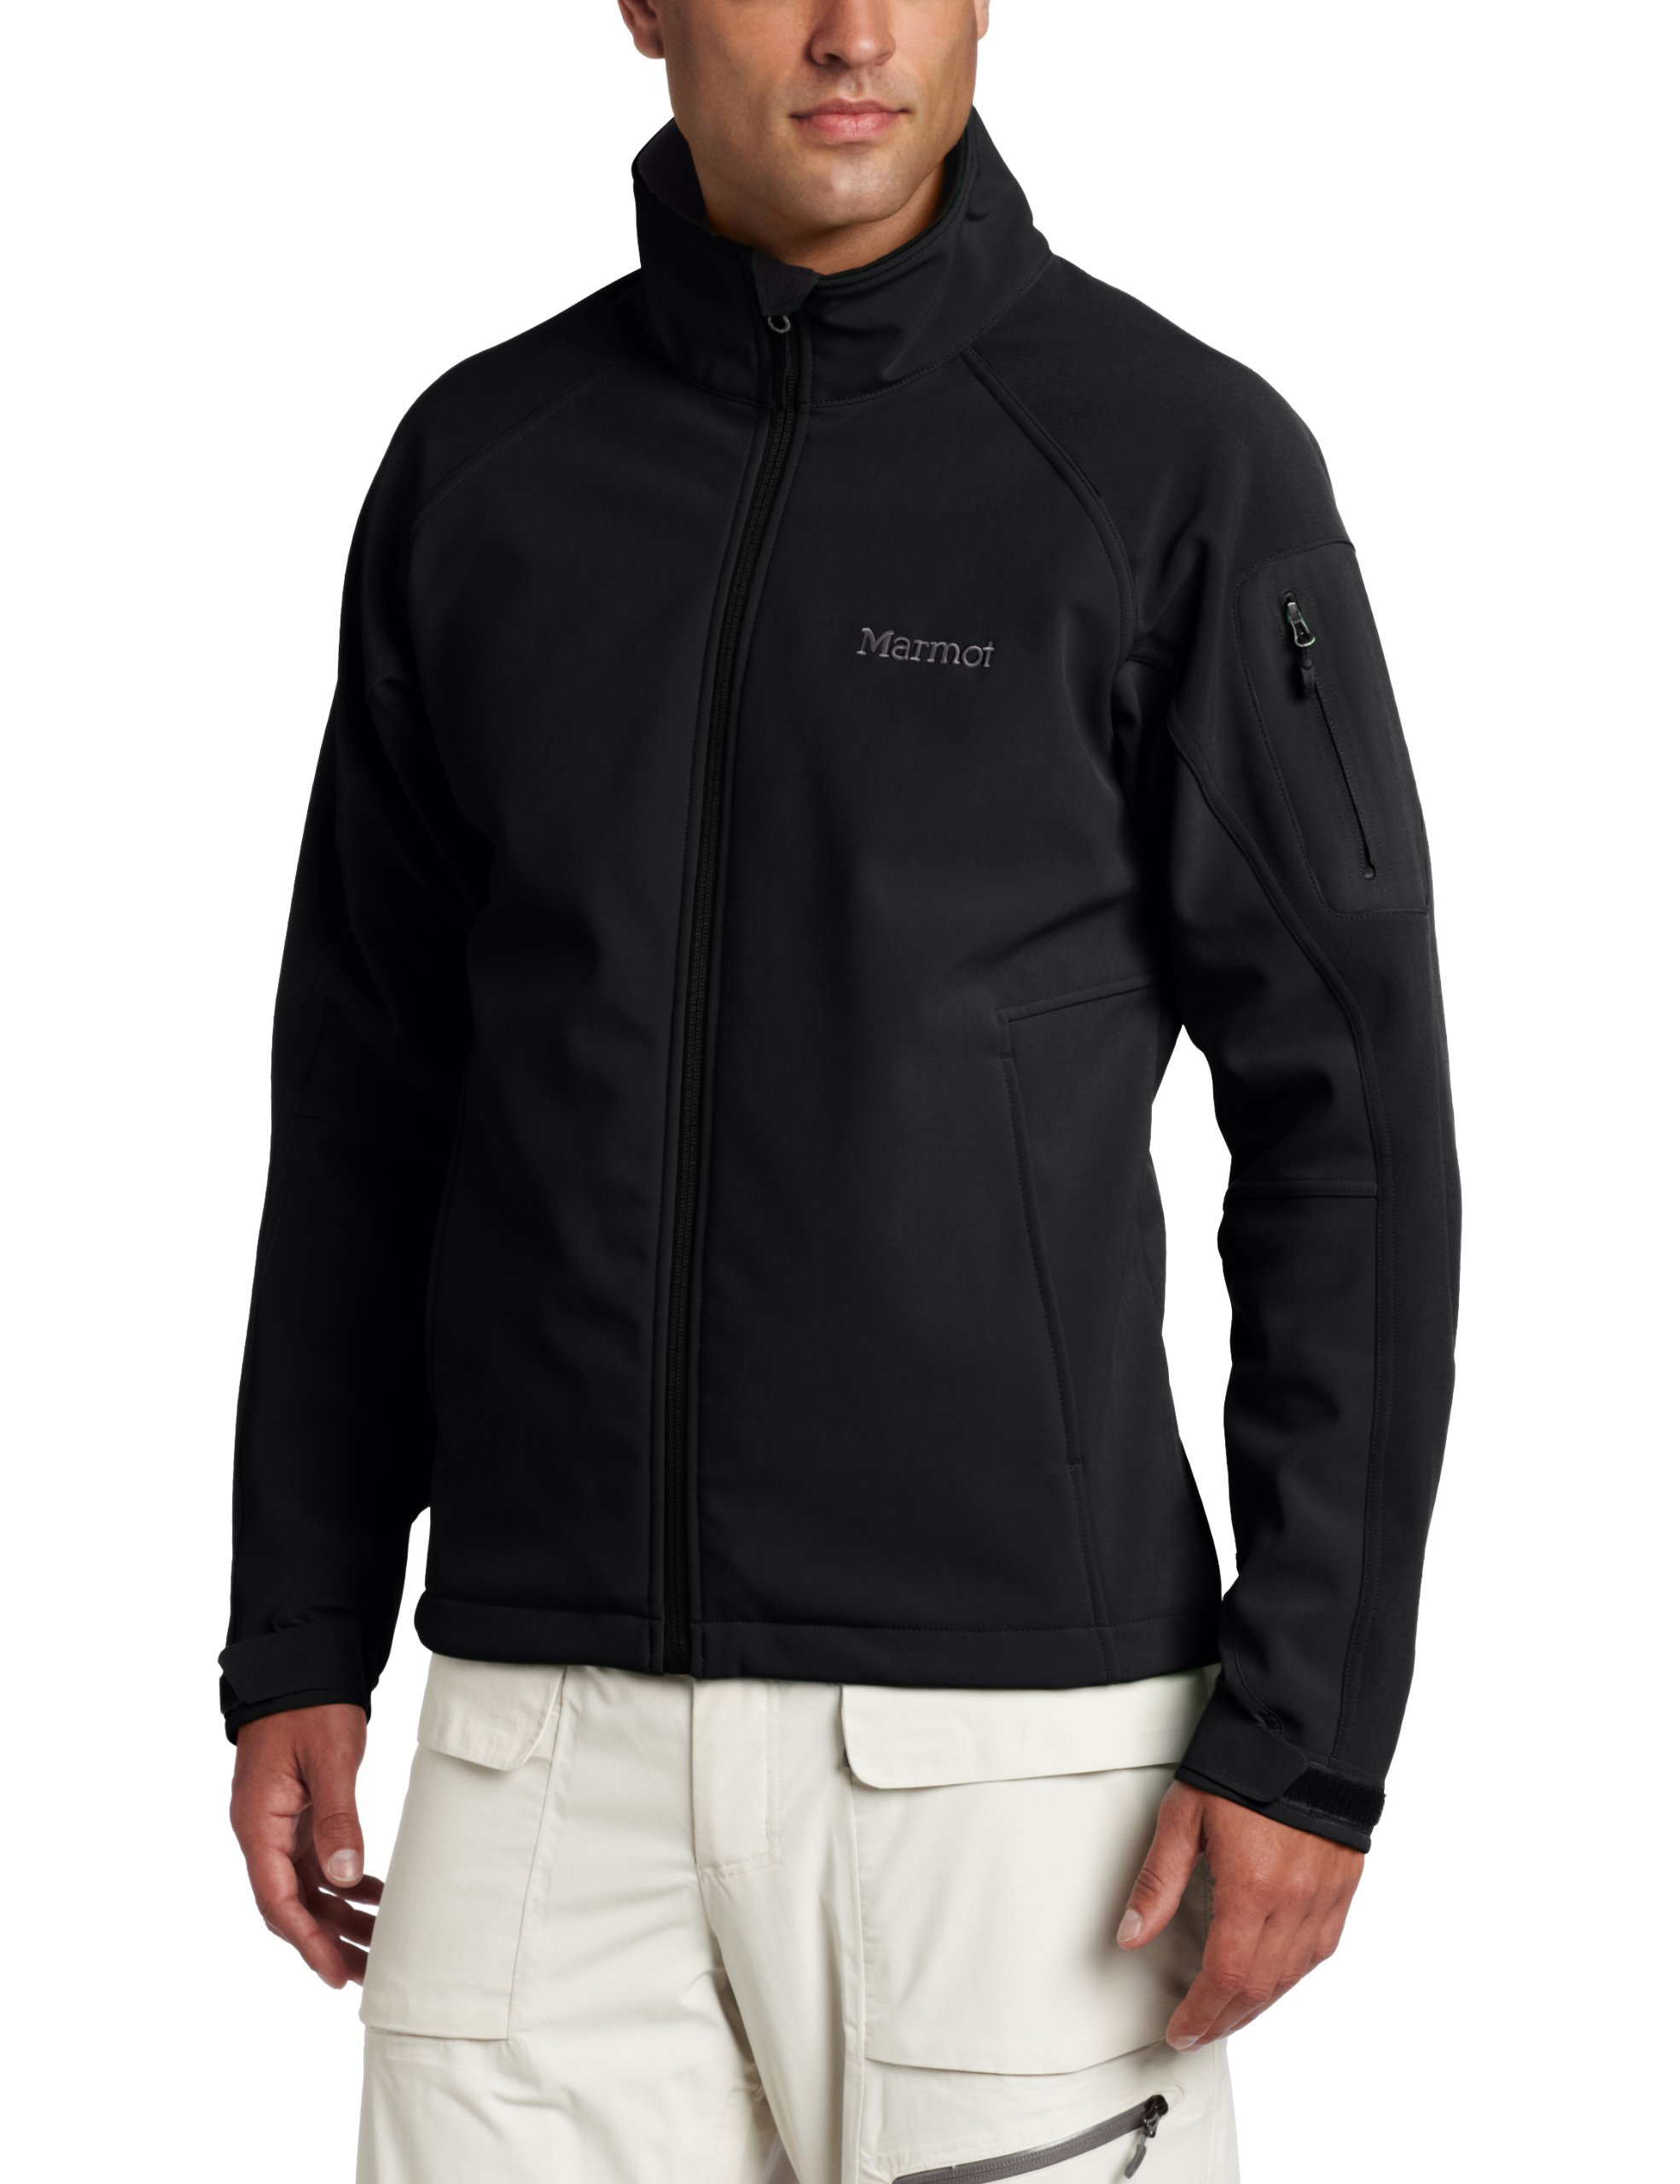 Marmot Men's Gravity Jacket, Black, XX-Large